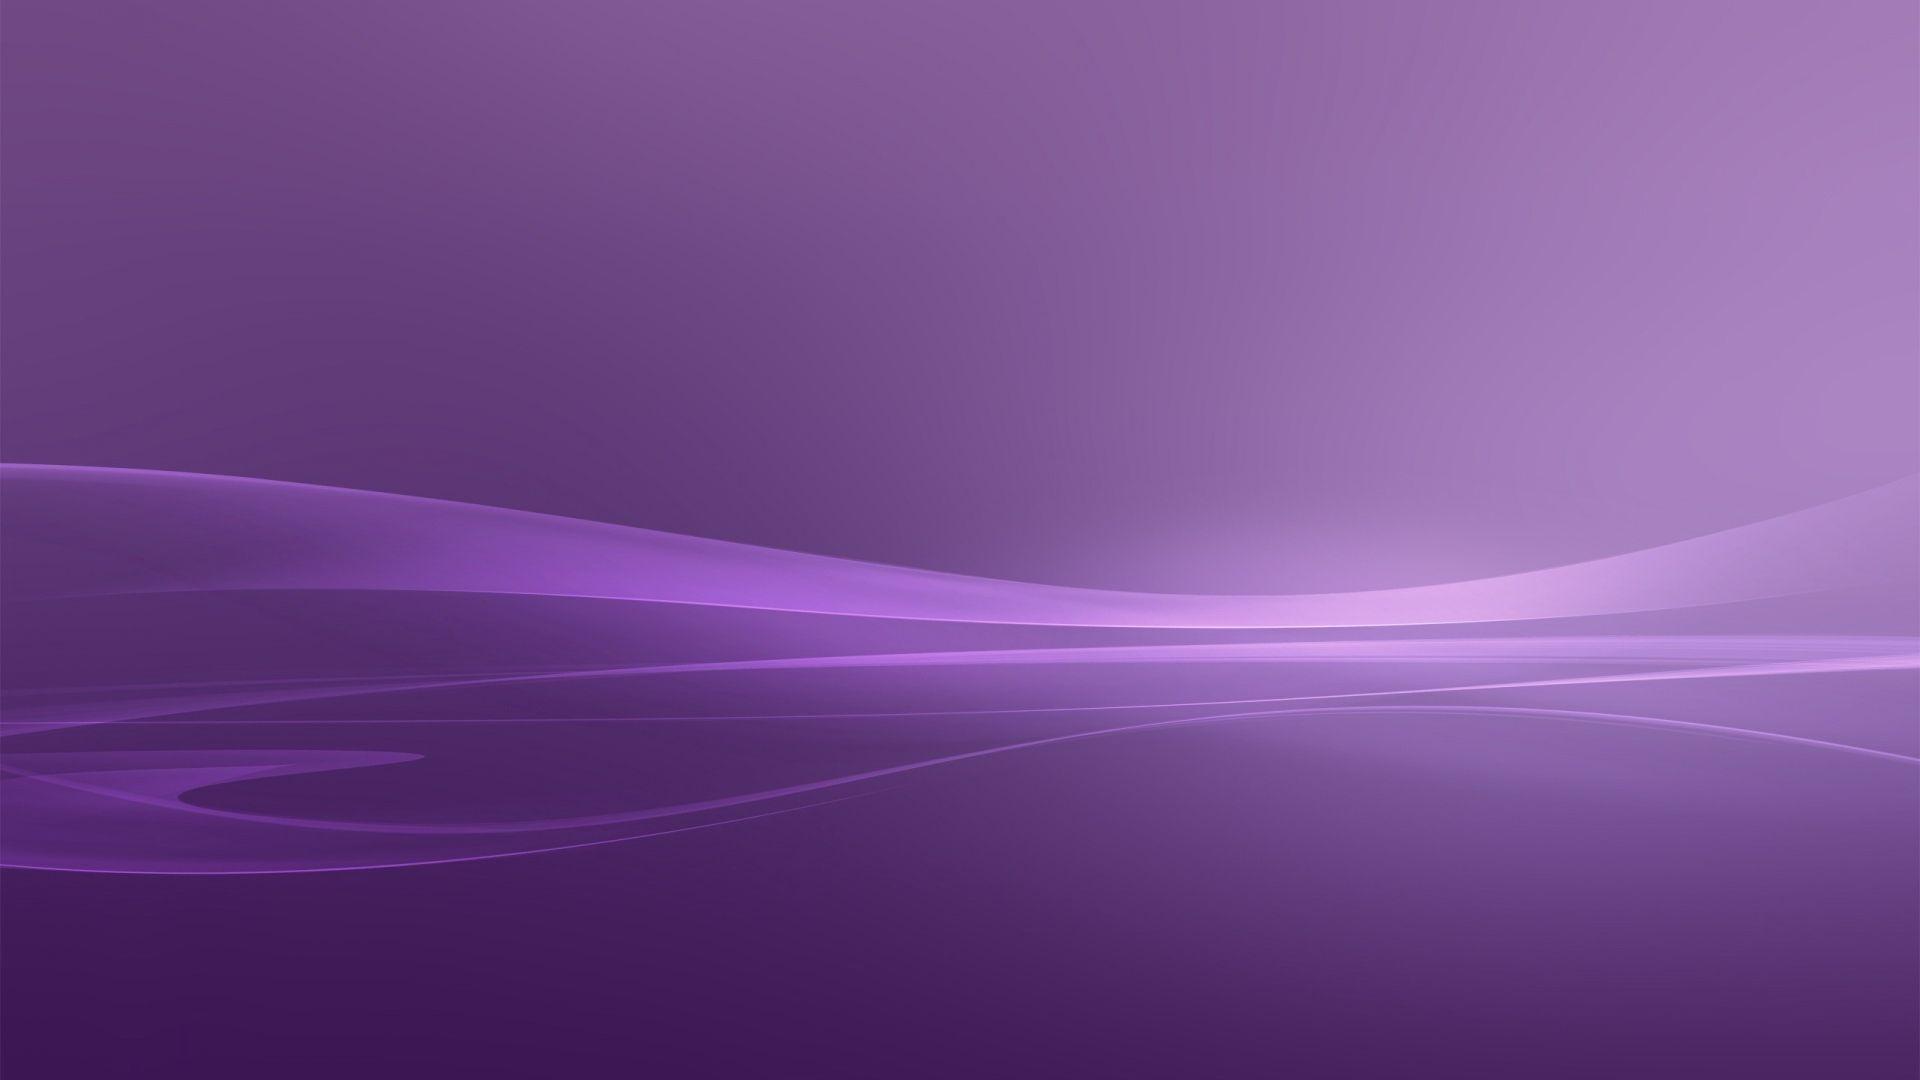 Purple And White wallpaper photo full hd